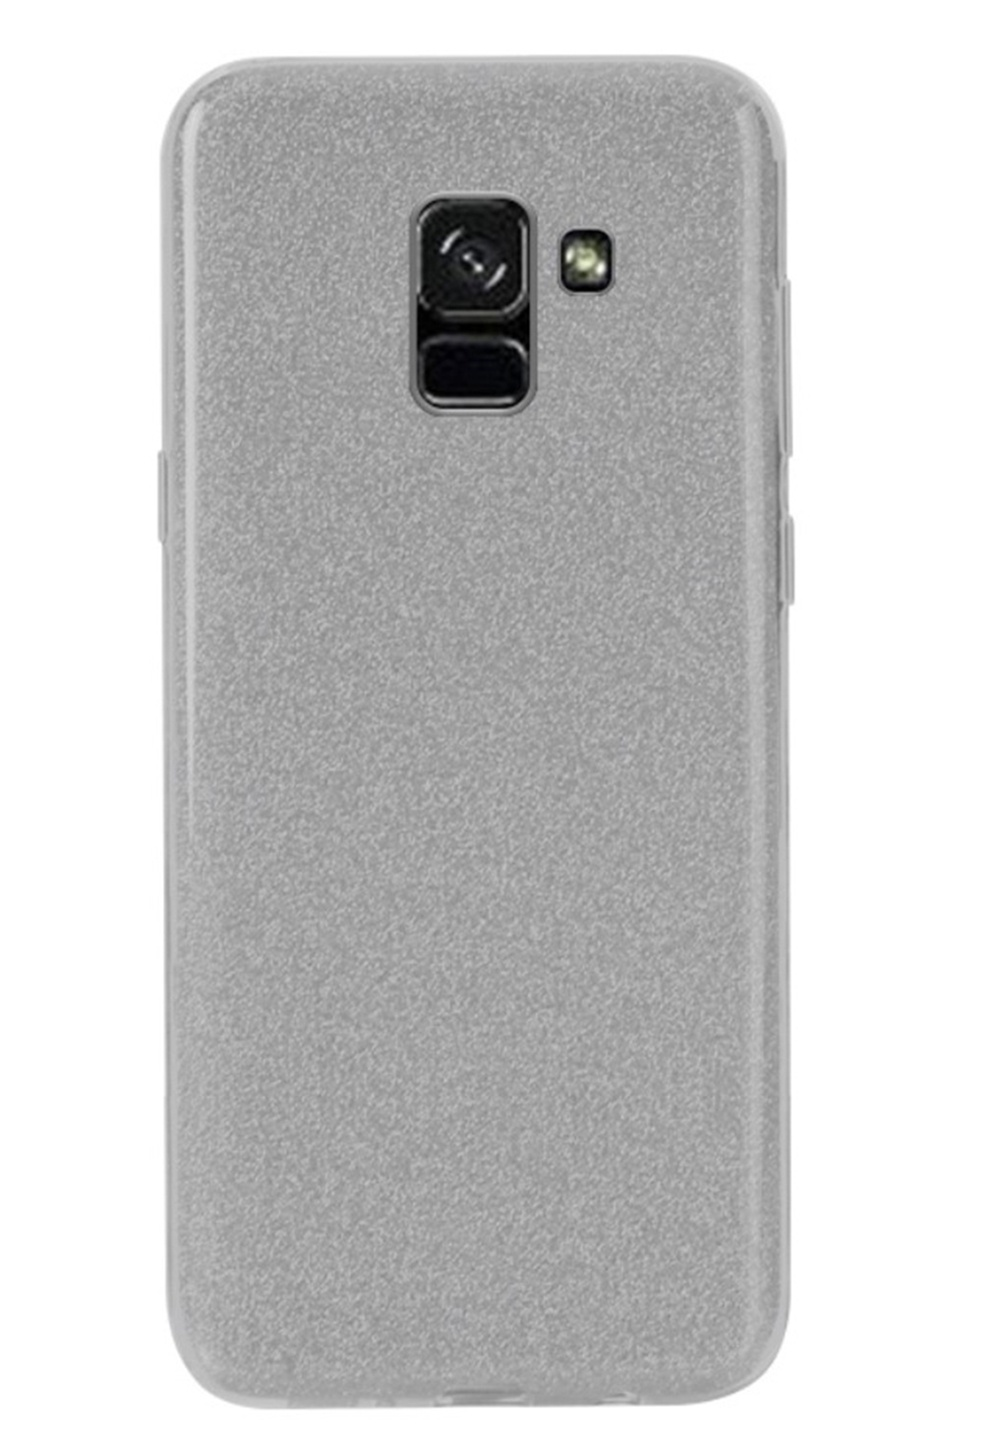 Чехол для сотового телефона Мобильная мода Samsung A8 Plus 2018 Накладка, NXE Glittery Powder PC + TPU, серый, 1528, серый металлик